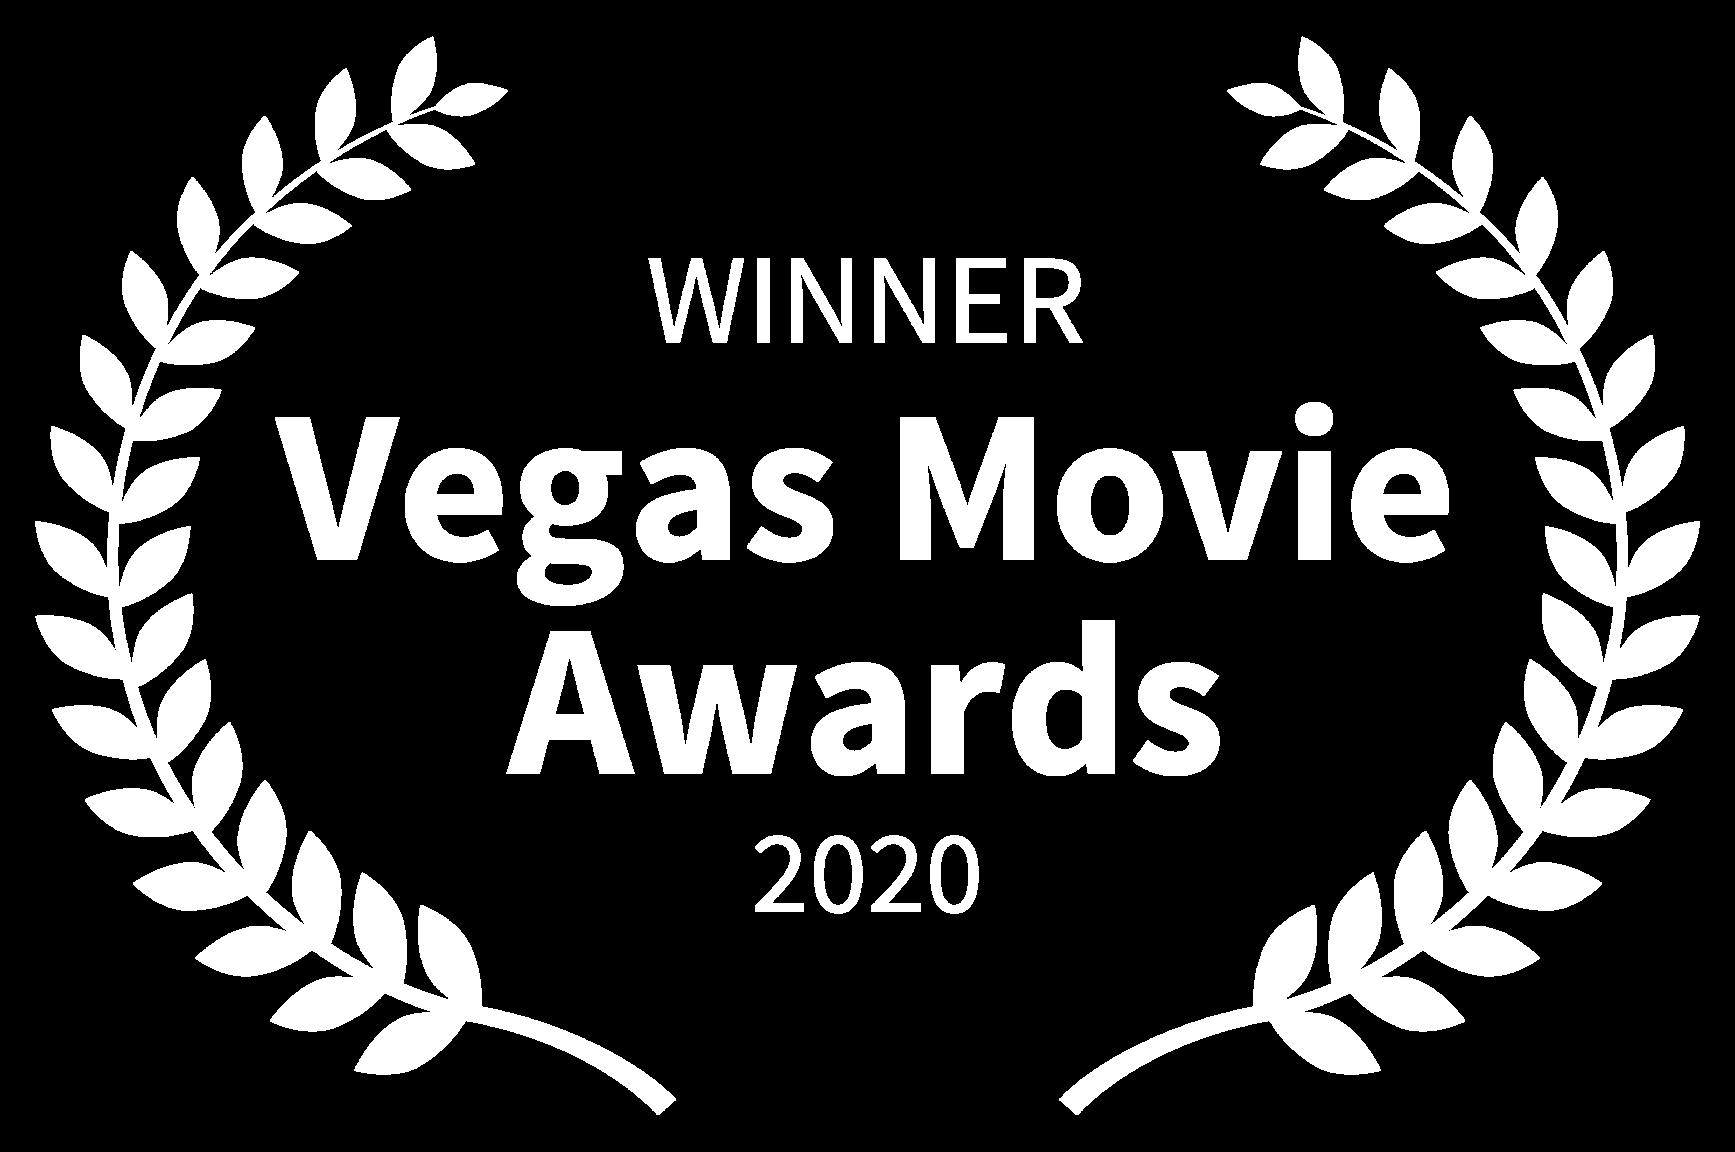 WINNER - Vegas Movie Awards - 2020 (1)